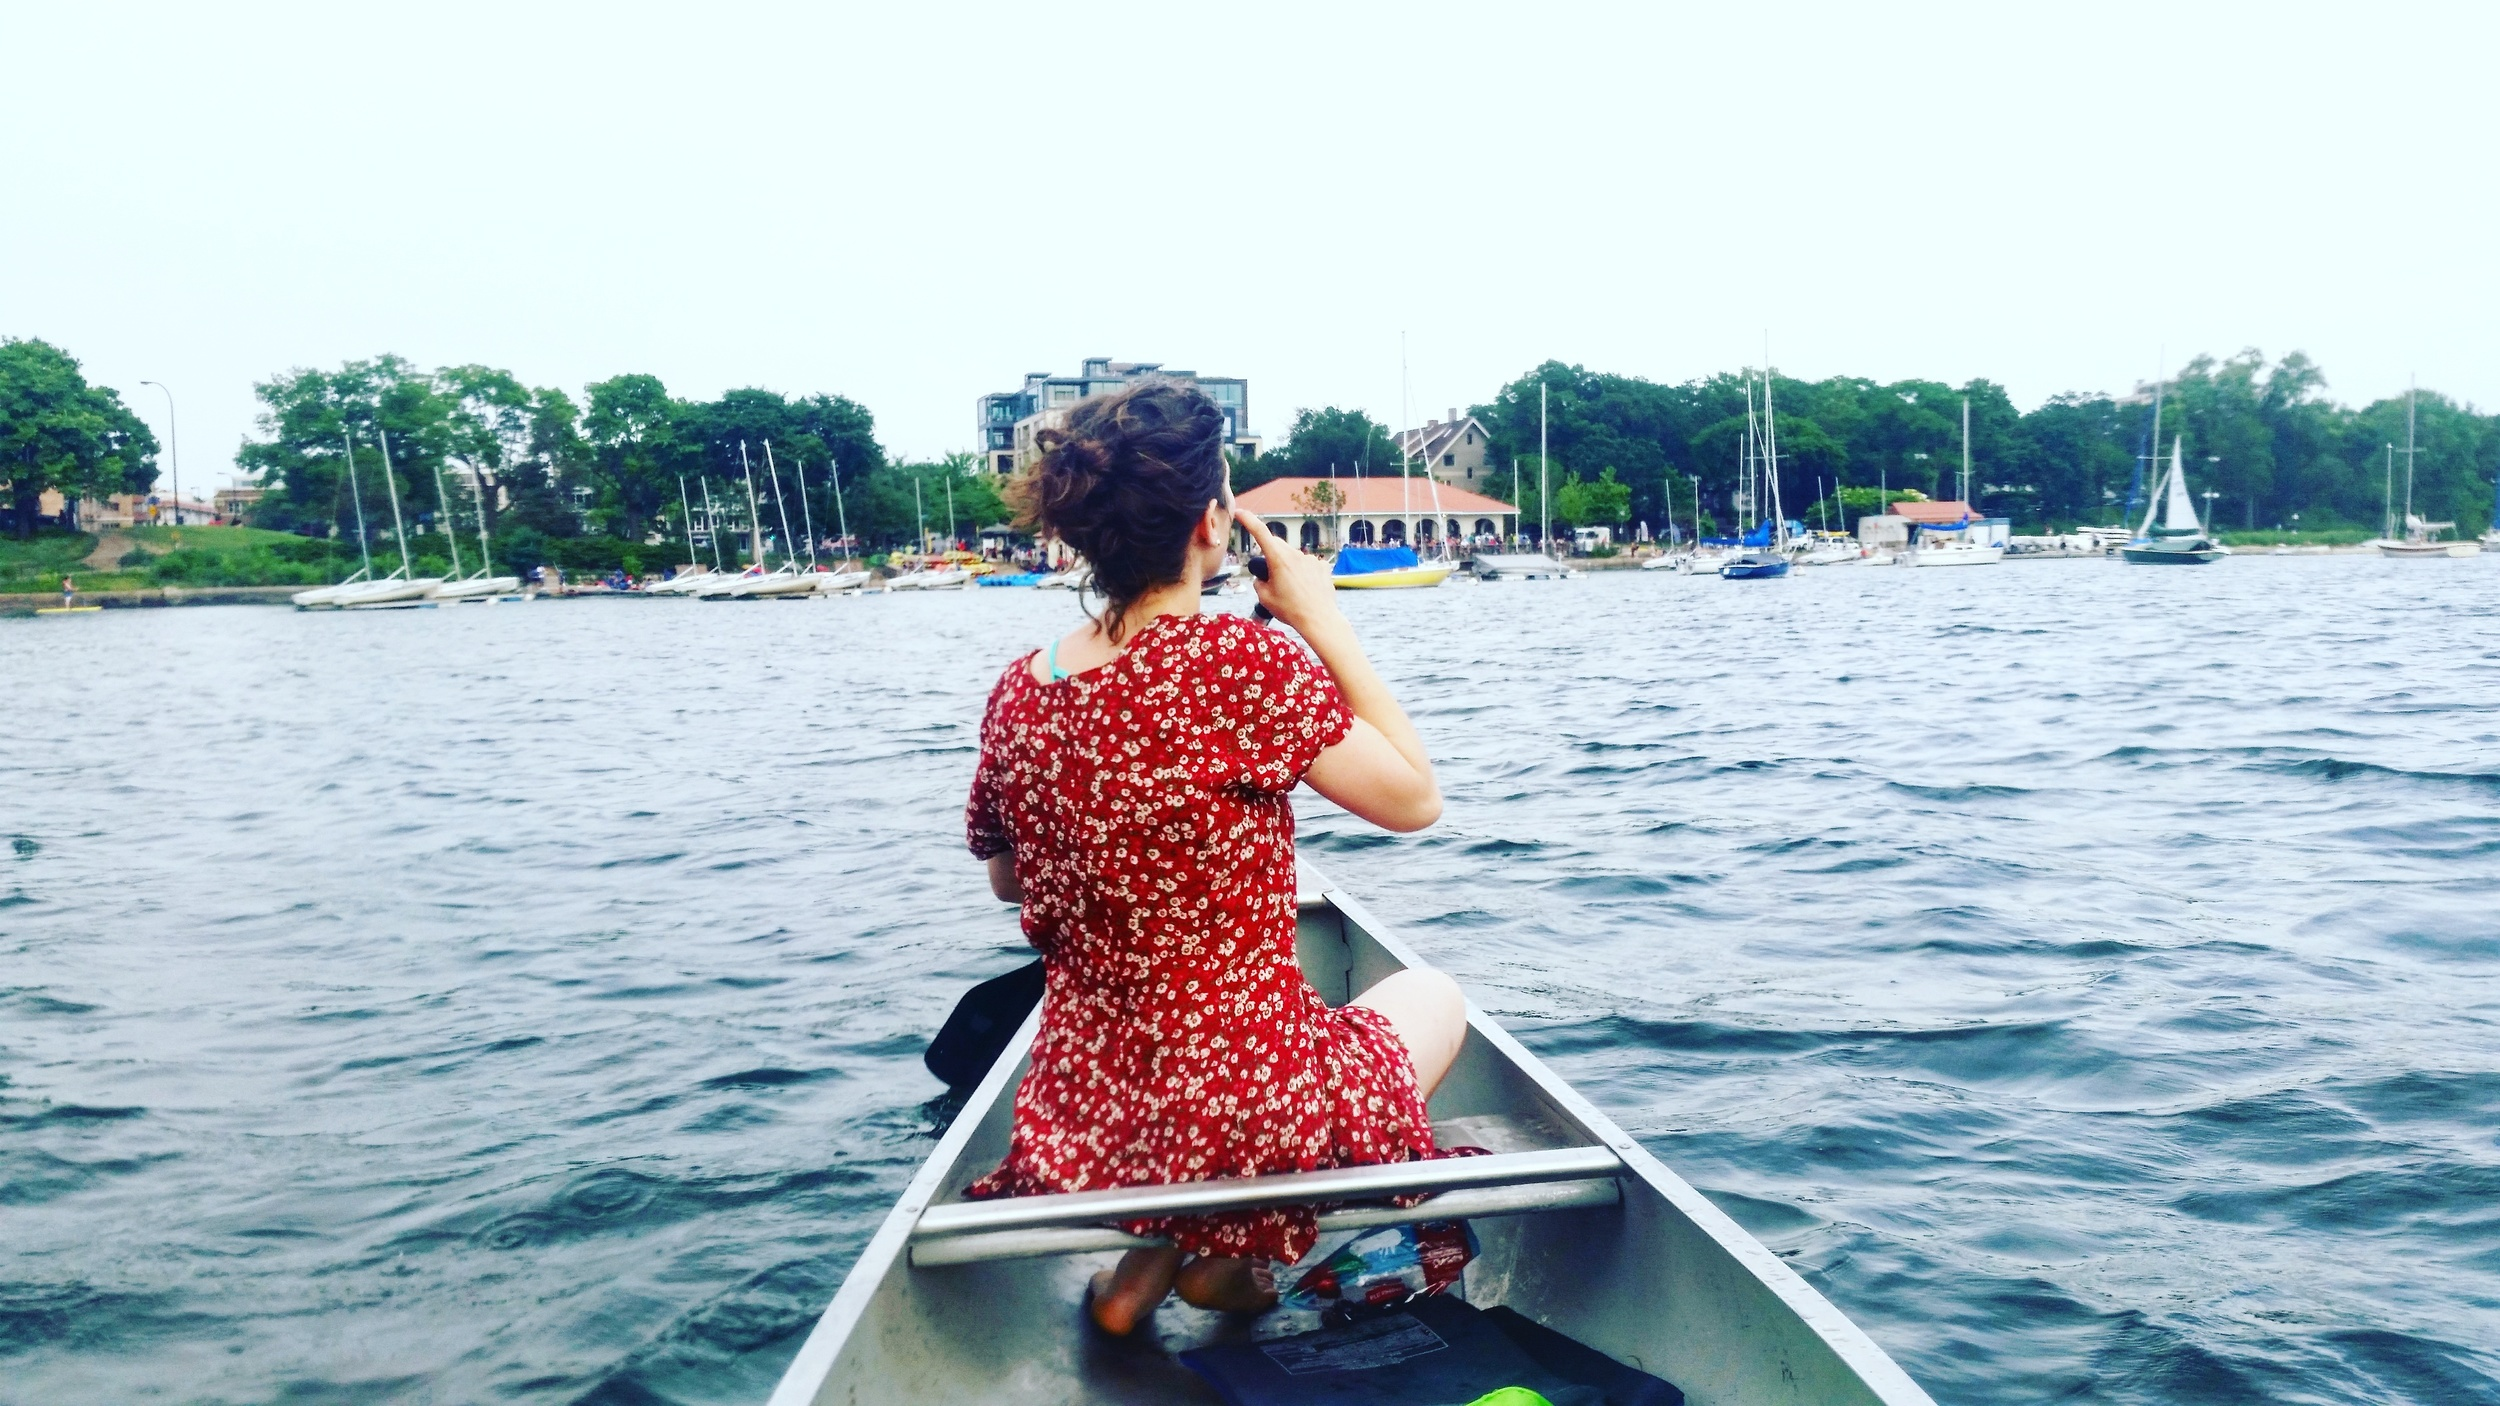 Pictured above: me pretending to be Pocahontas on Lake Calhoun